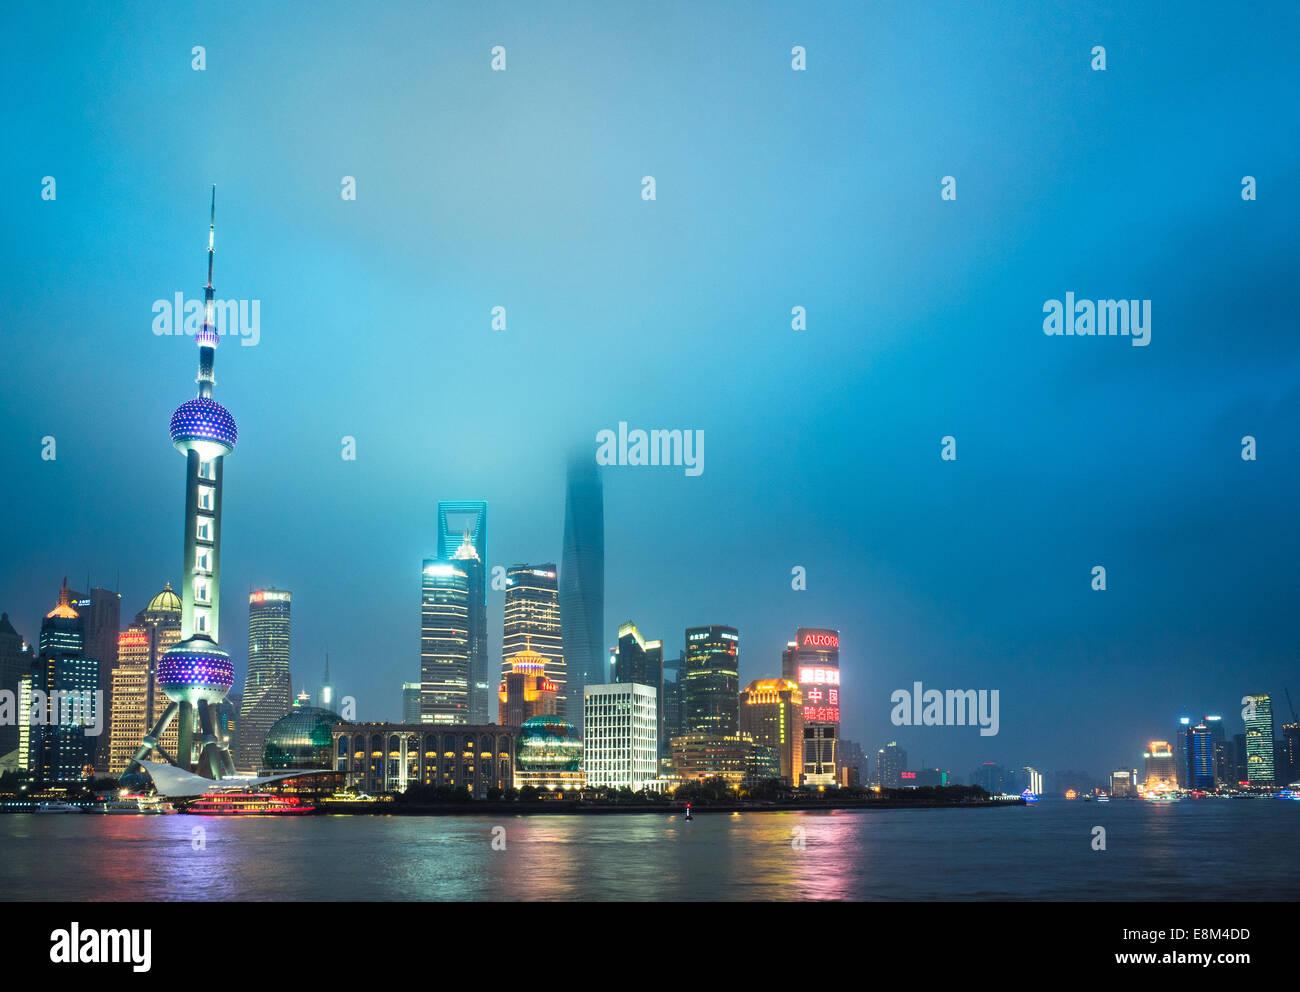 Skyline of shanghai the bund at night, landmark of China. - Stock Image